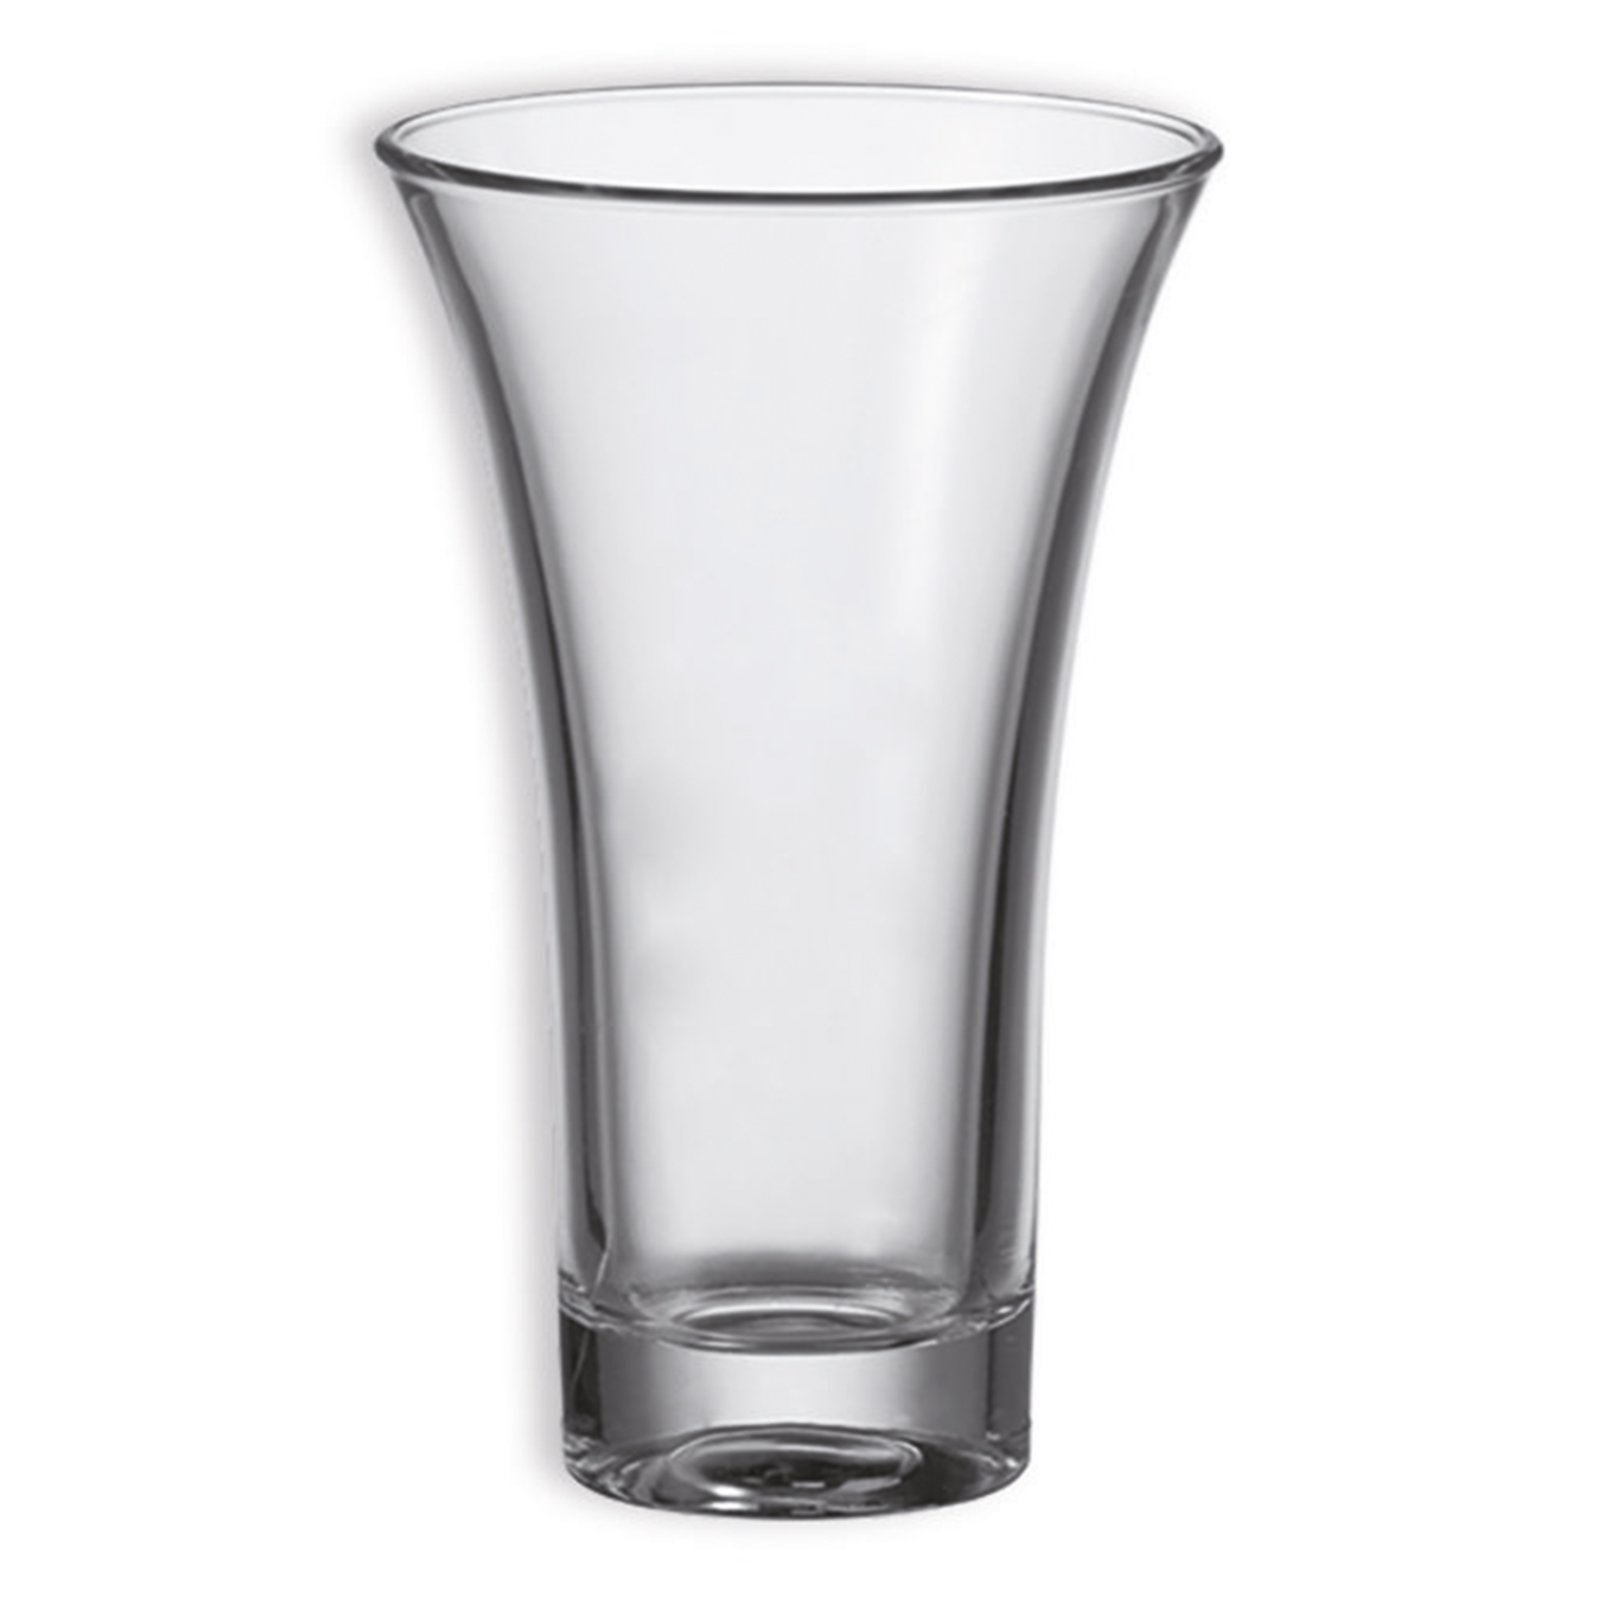 Vase FIORI GRANDE - klar - Glas - 20 cm hoch